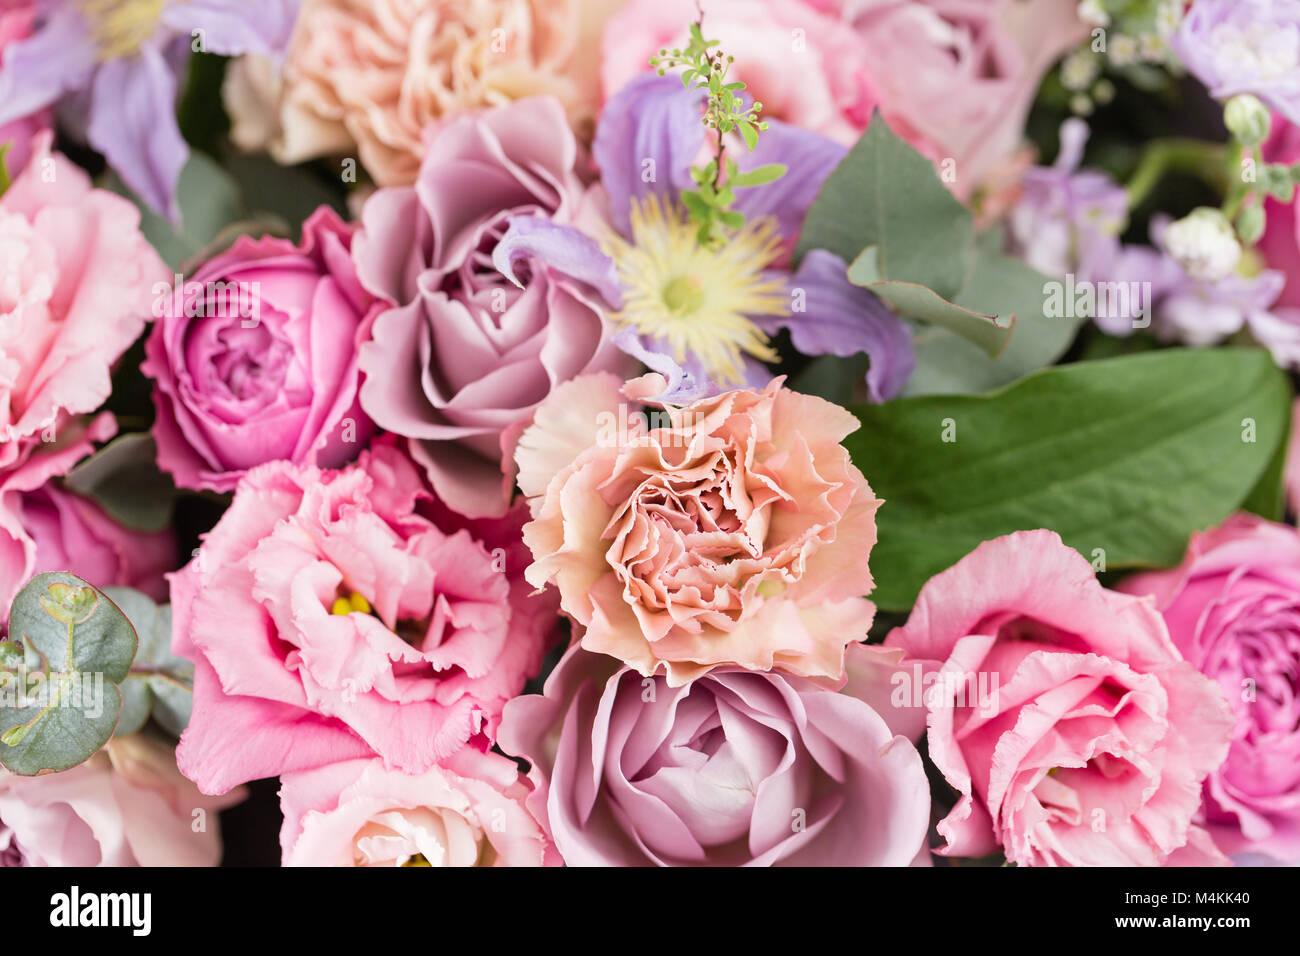 Stunning luxury bouquet flowers photos wedding and flowers close up beautiful luxury bouquet of mixed flowers in glass vases izmirmasajfo Choice Image